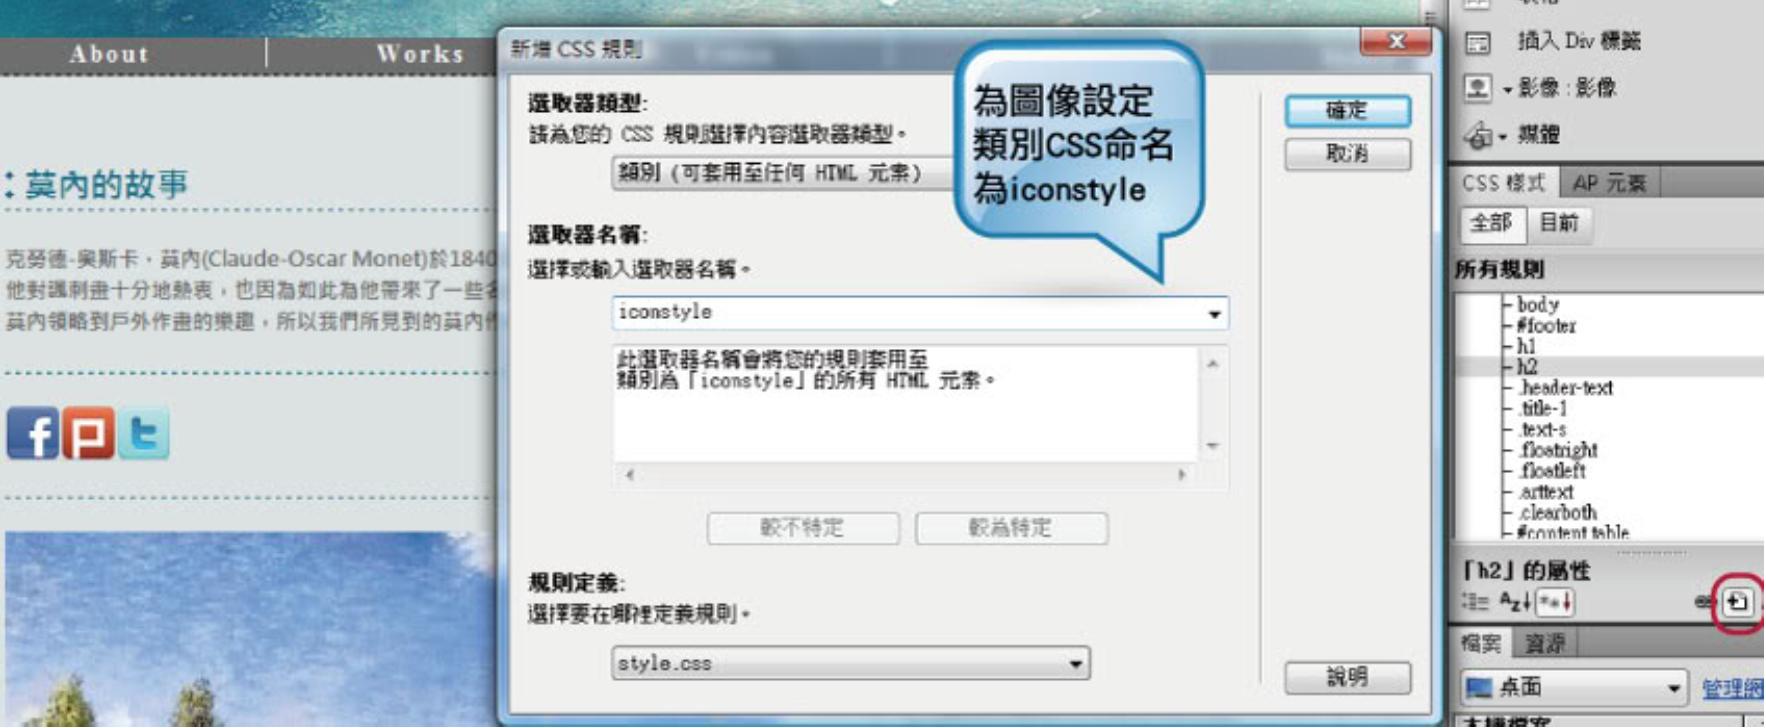 http://mepopedia.com/~jinjin/web/img/512.png